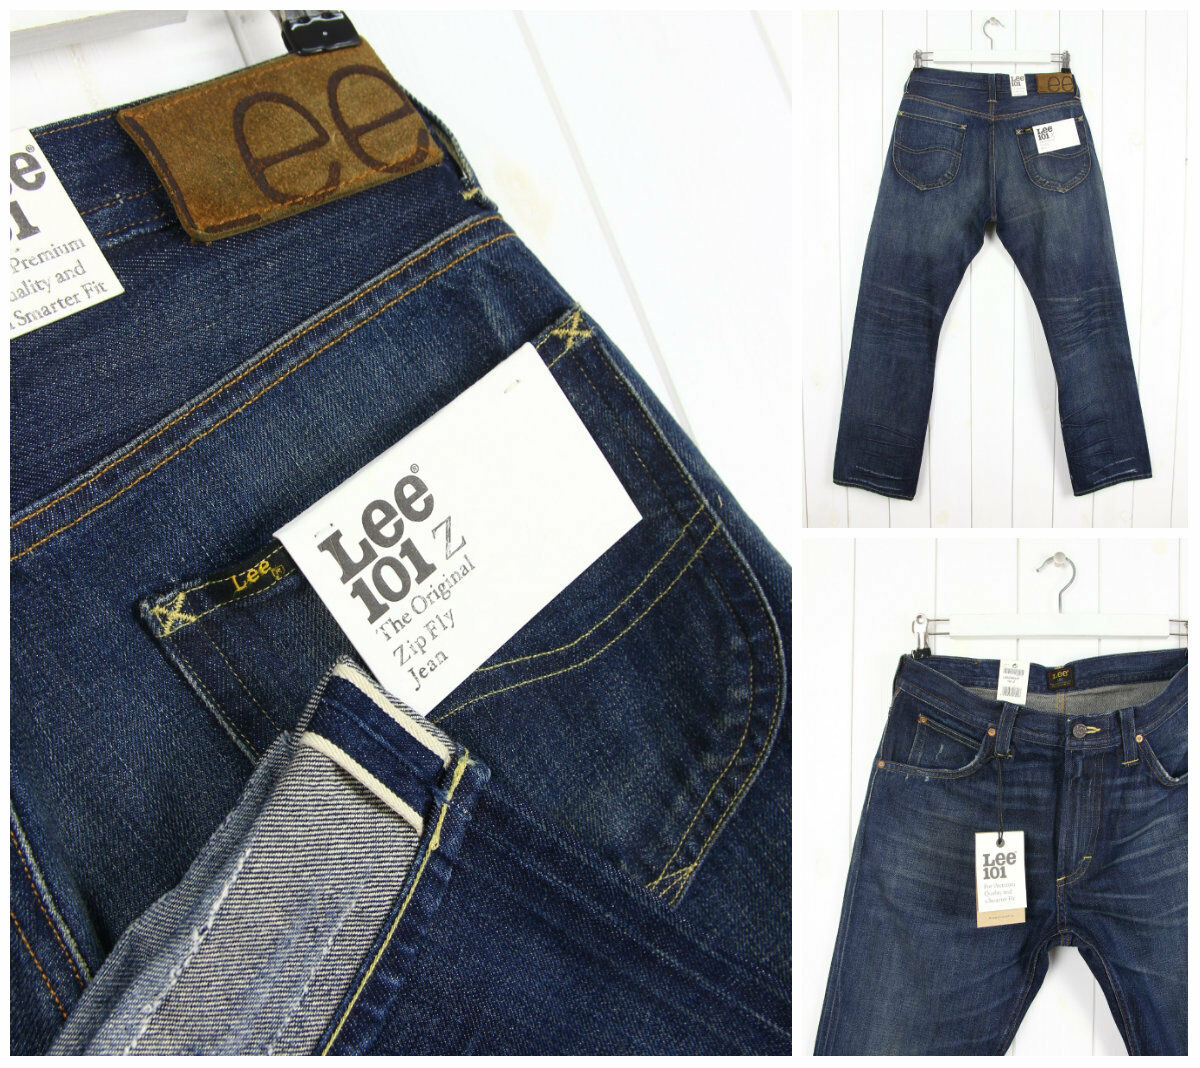 Nuovo Lee 101Z 101Z 101Z The Original Patta con Zip Jeans Cimossa Denim Gamba Dritta W33 ebc877